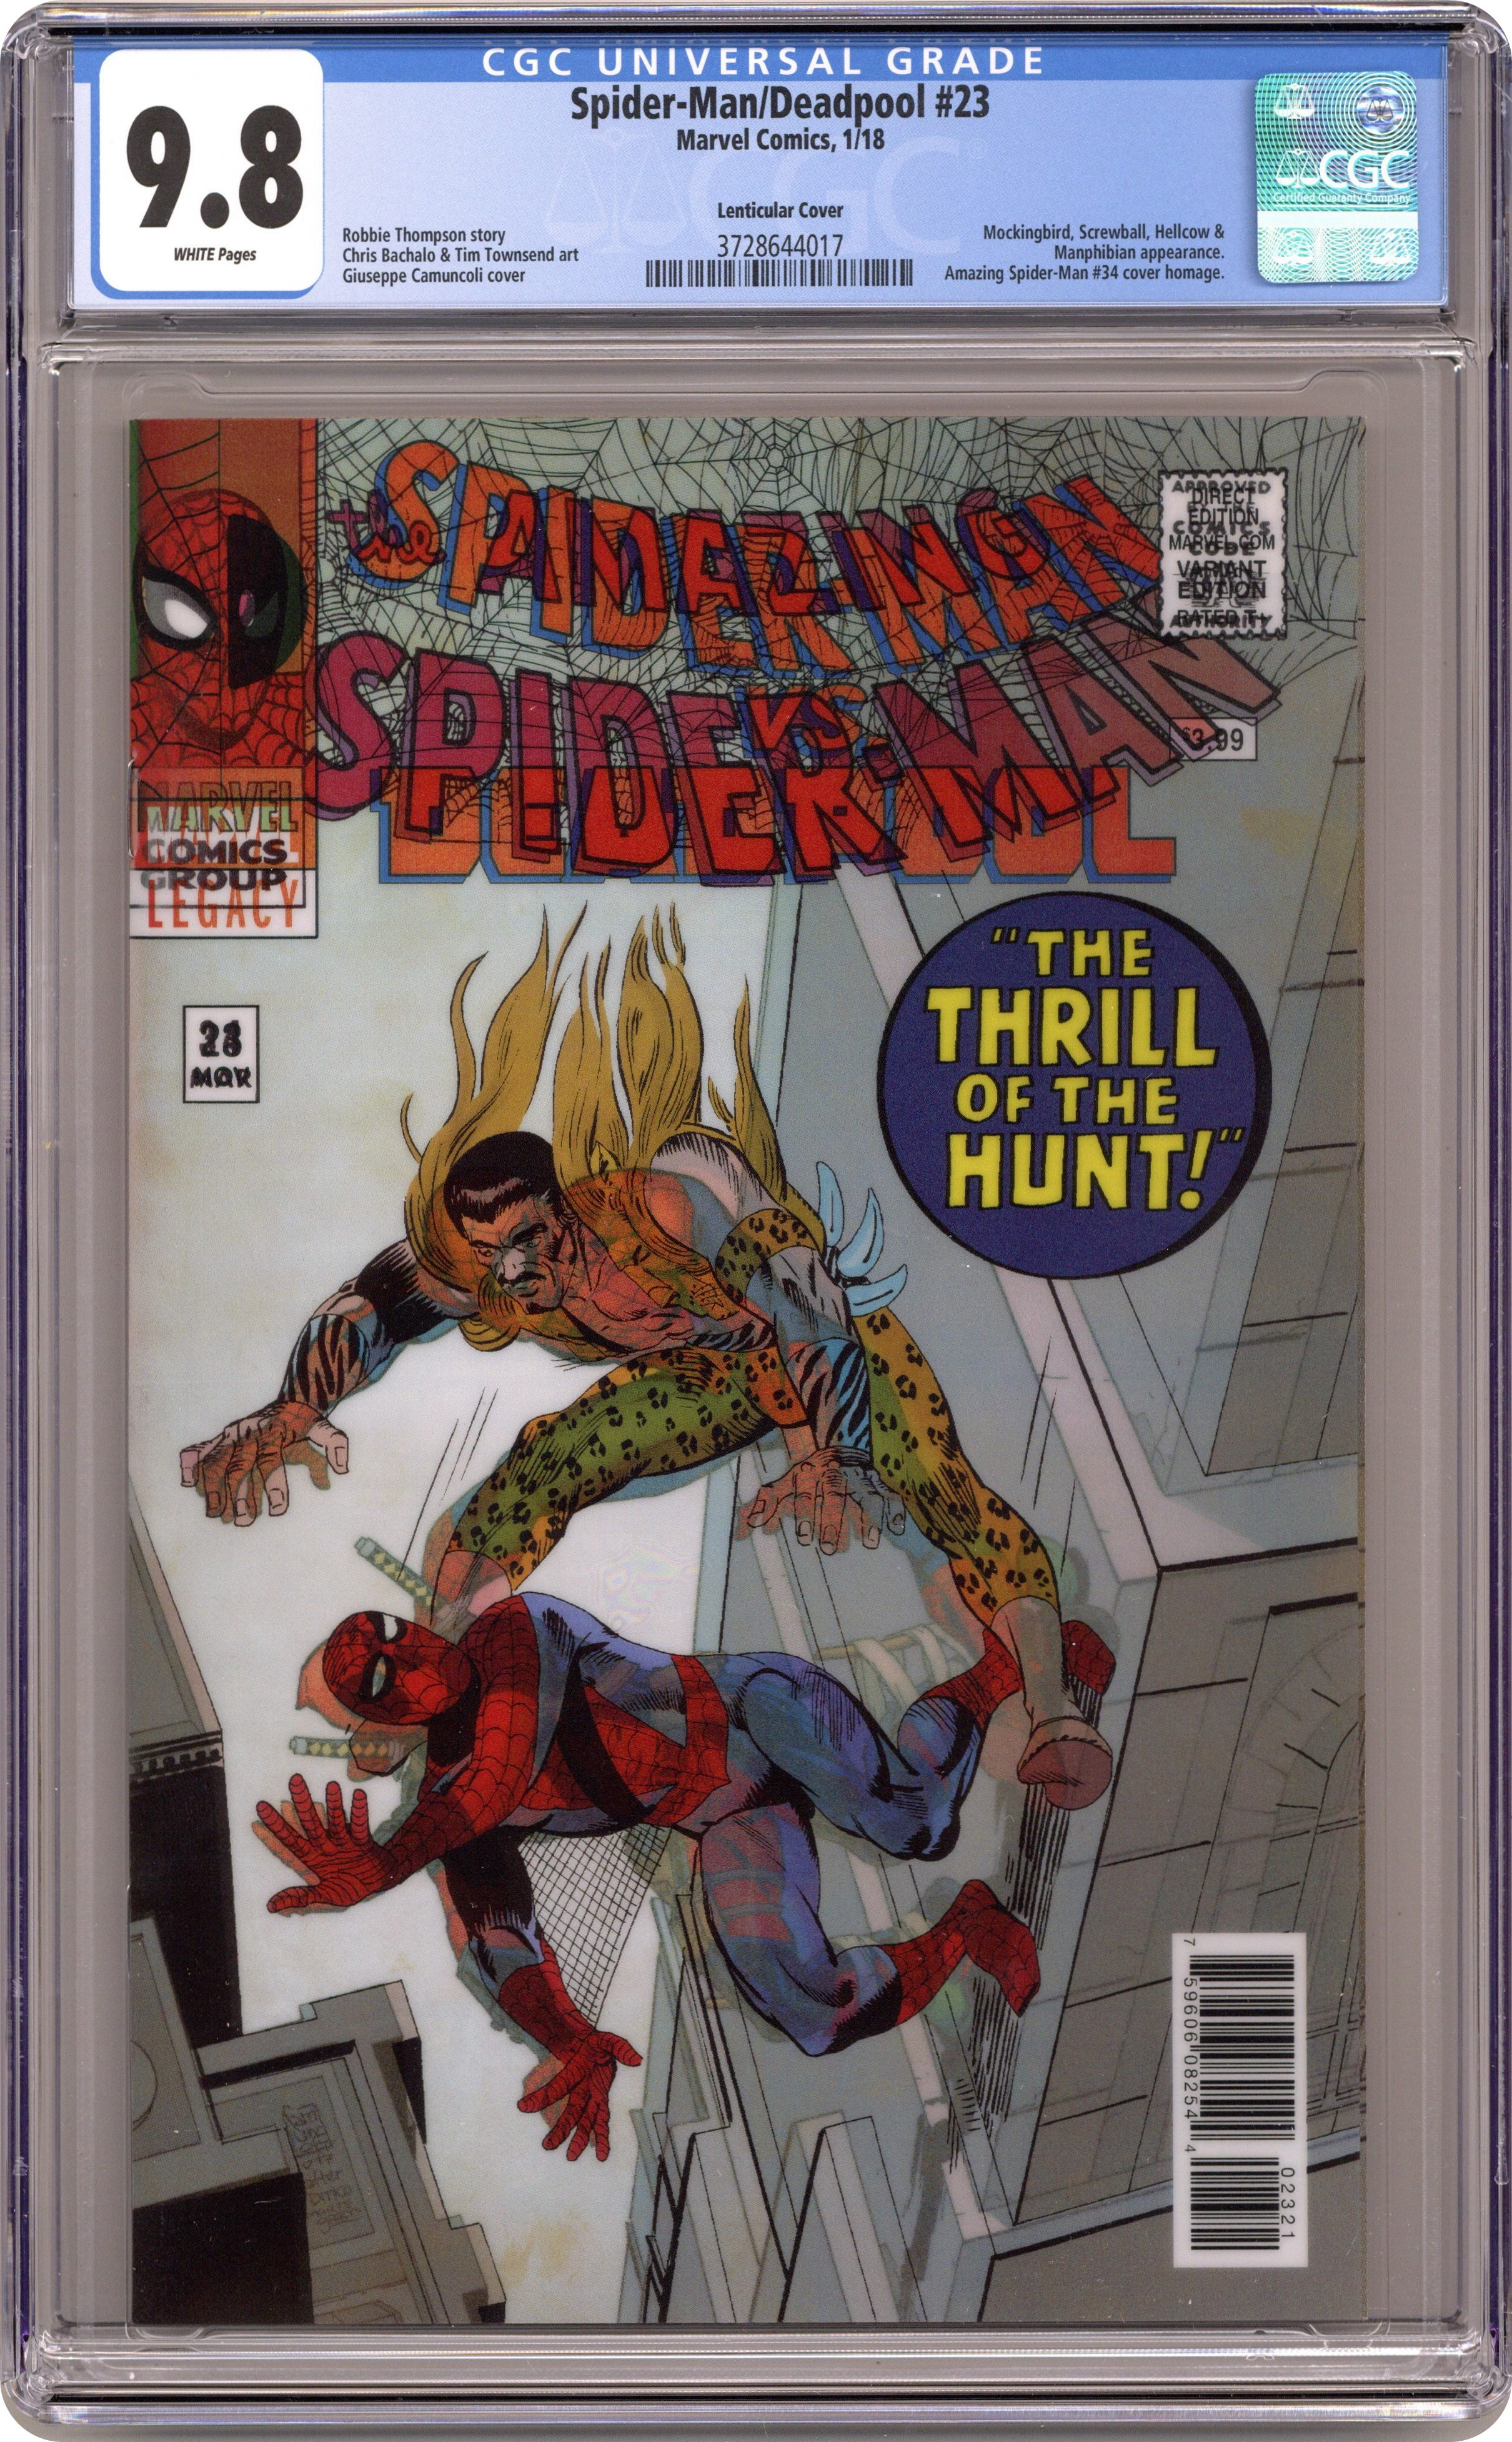 Spider-Man Deadpool #2 1:25 RETAILER INCENTIVE